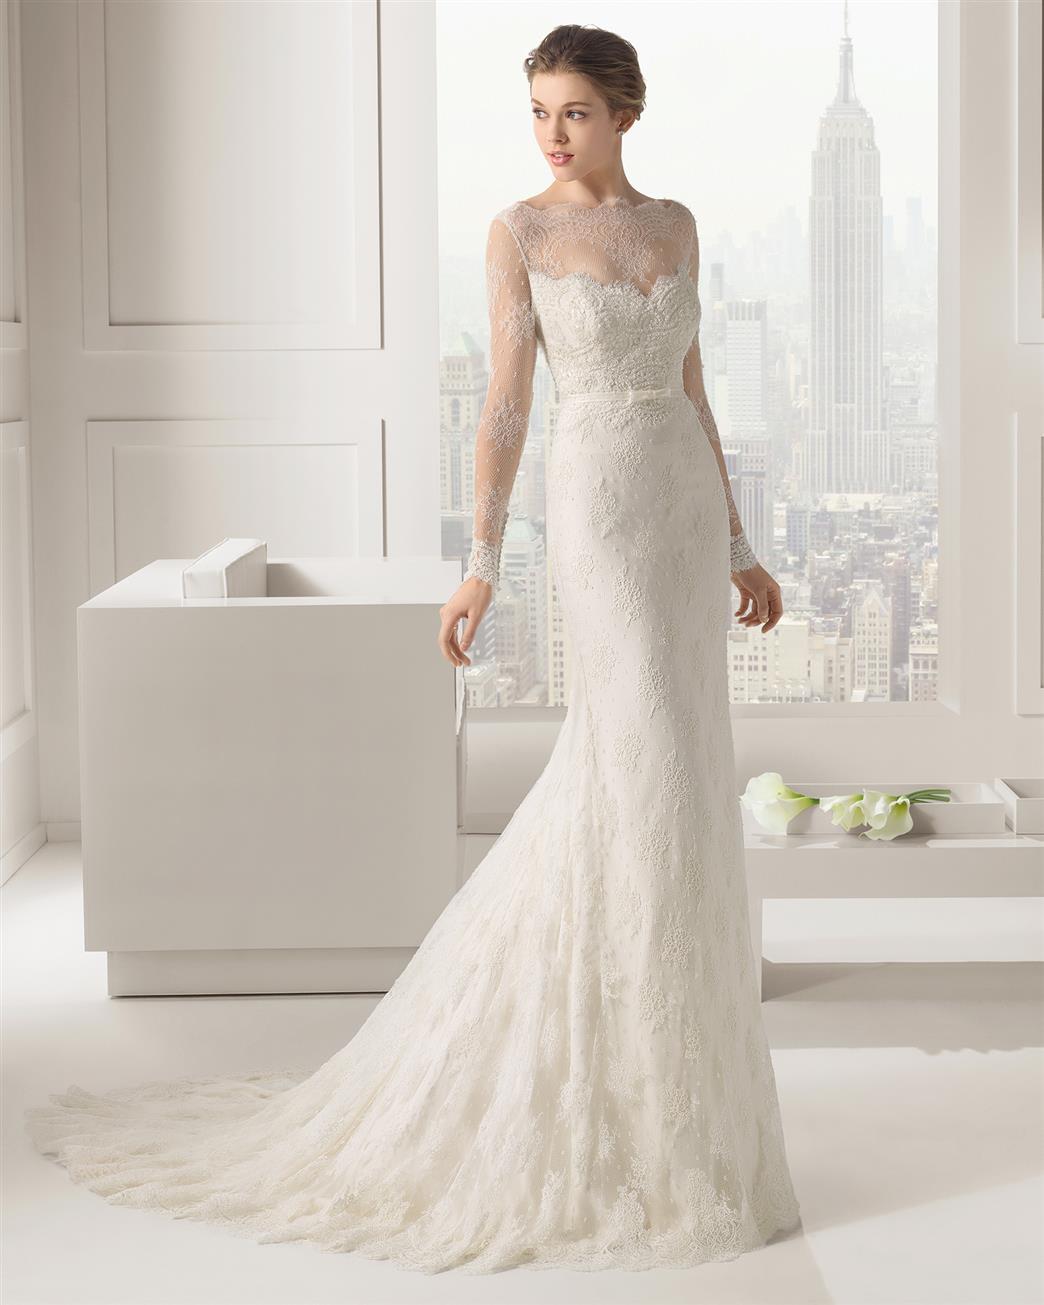 long sleeve wedding dresses wedding dress long sleeve Long Sleeve Wedding Dress from Rosa Clara Collection Santafe